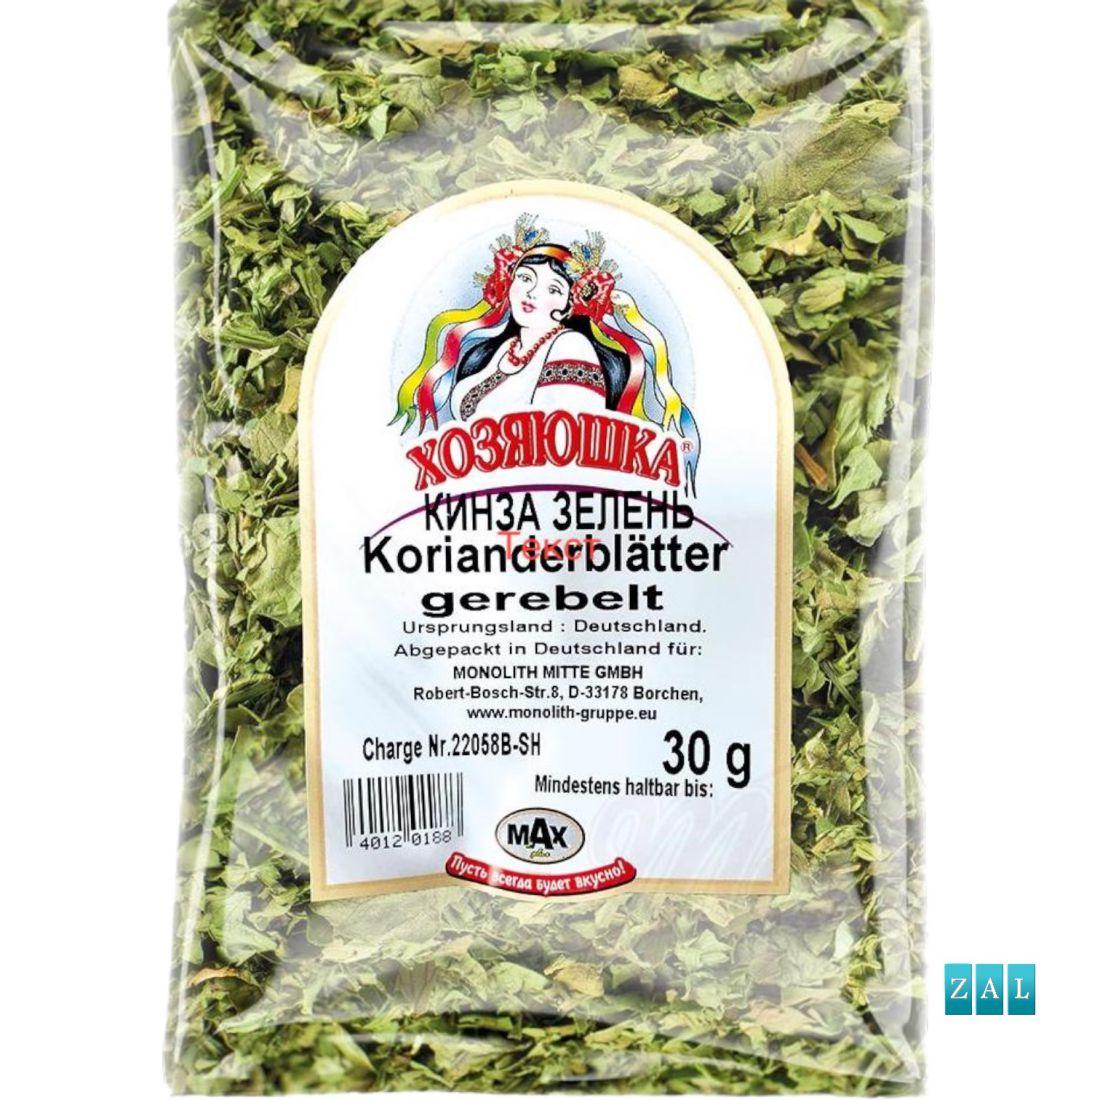 Morzsolt korianderlevelek 30g